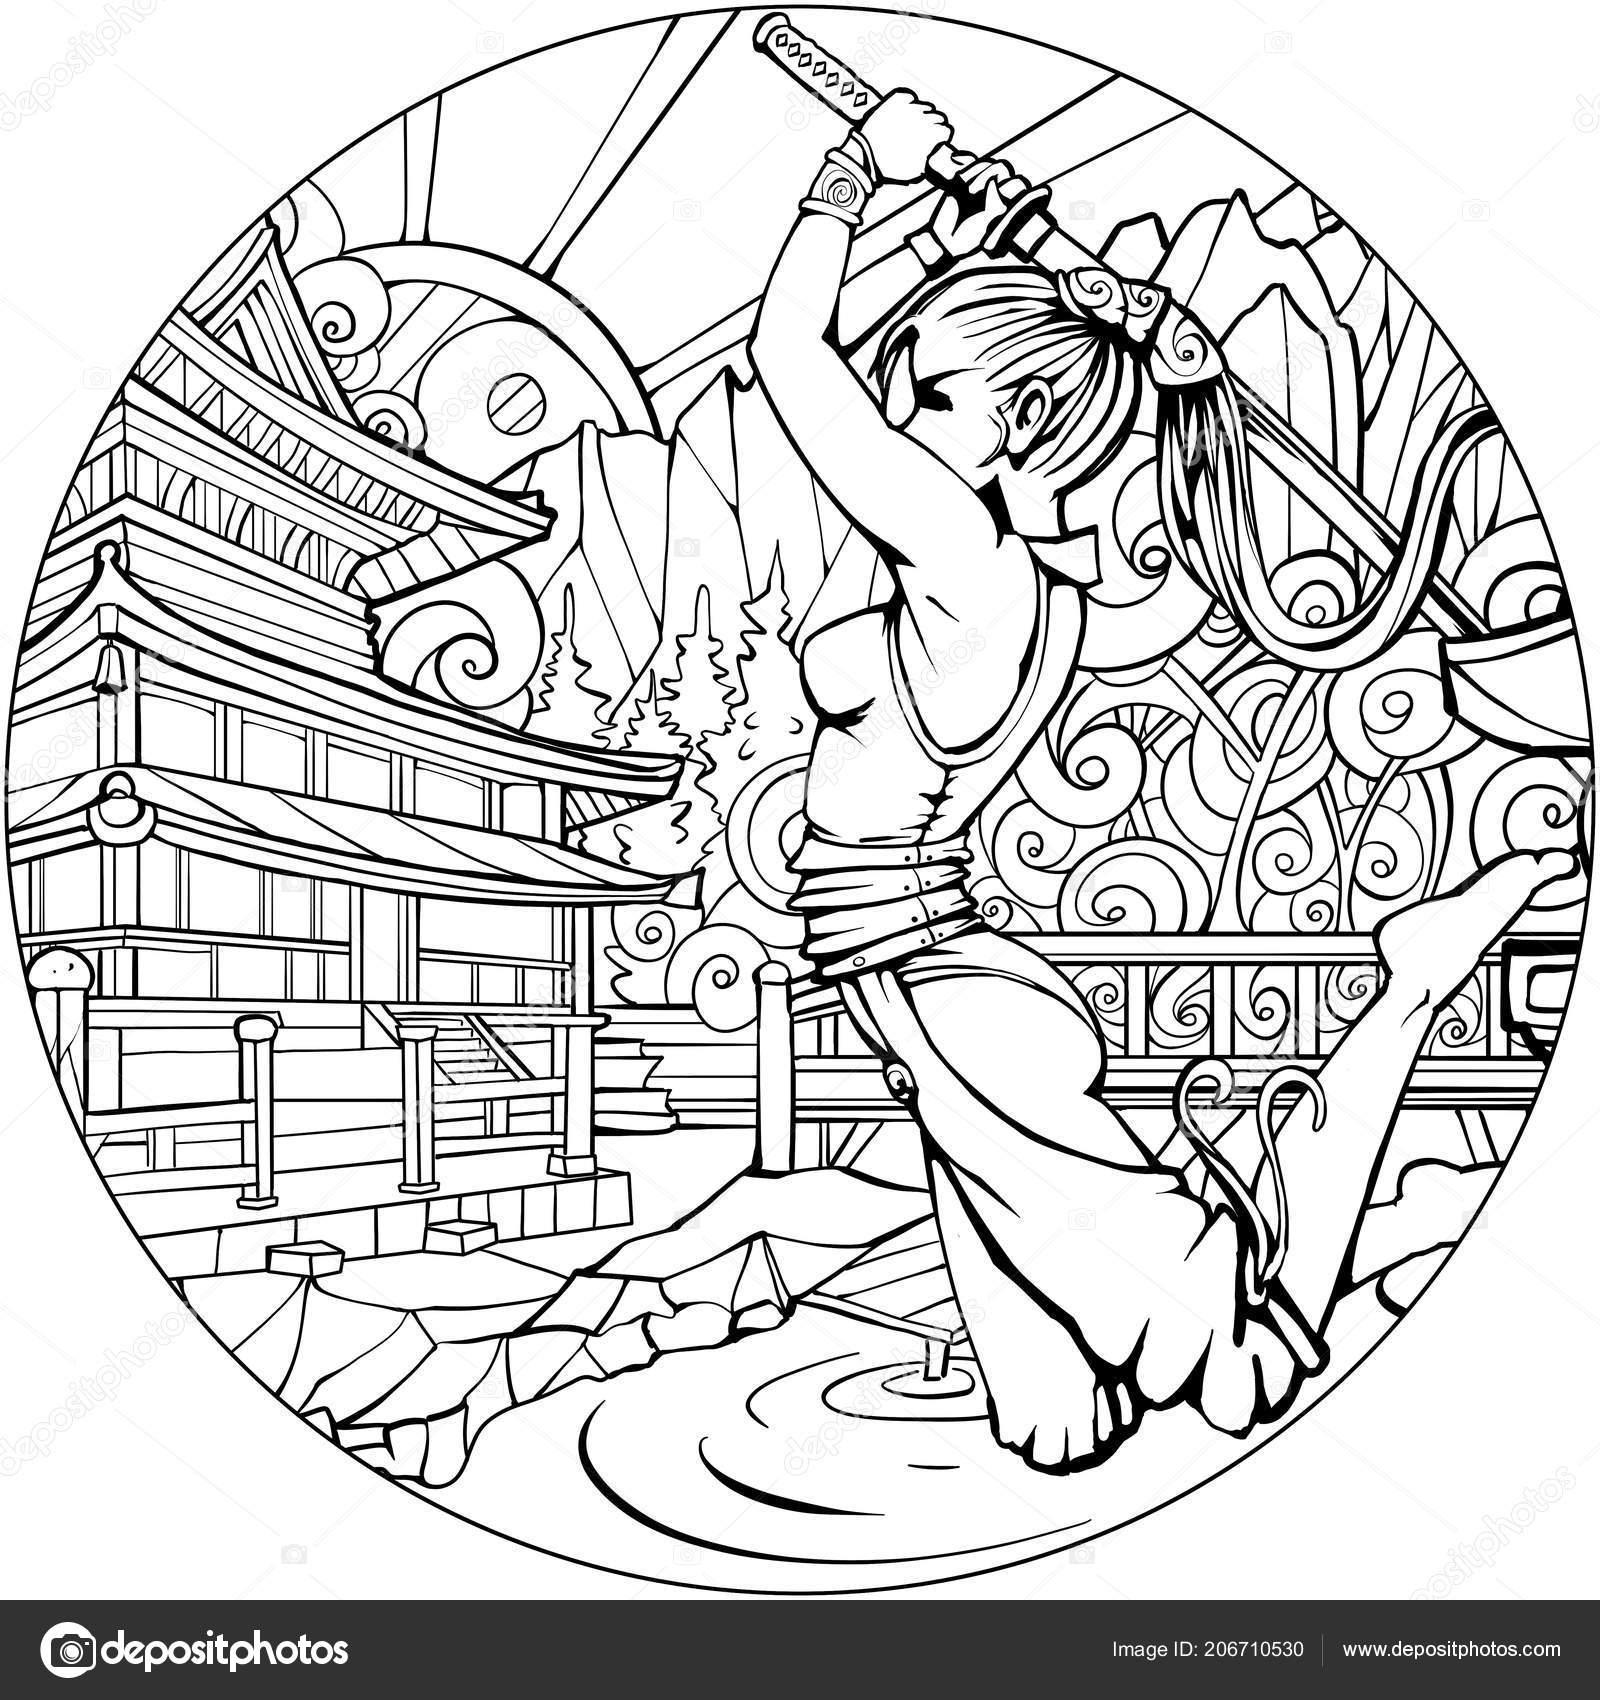 malvorlage samurai  coloring and malvorlagan